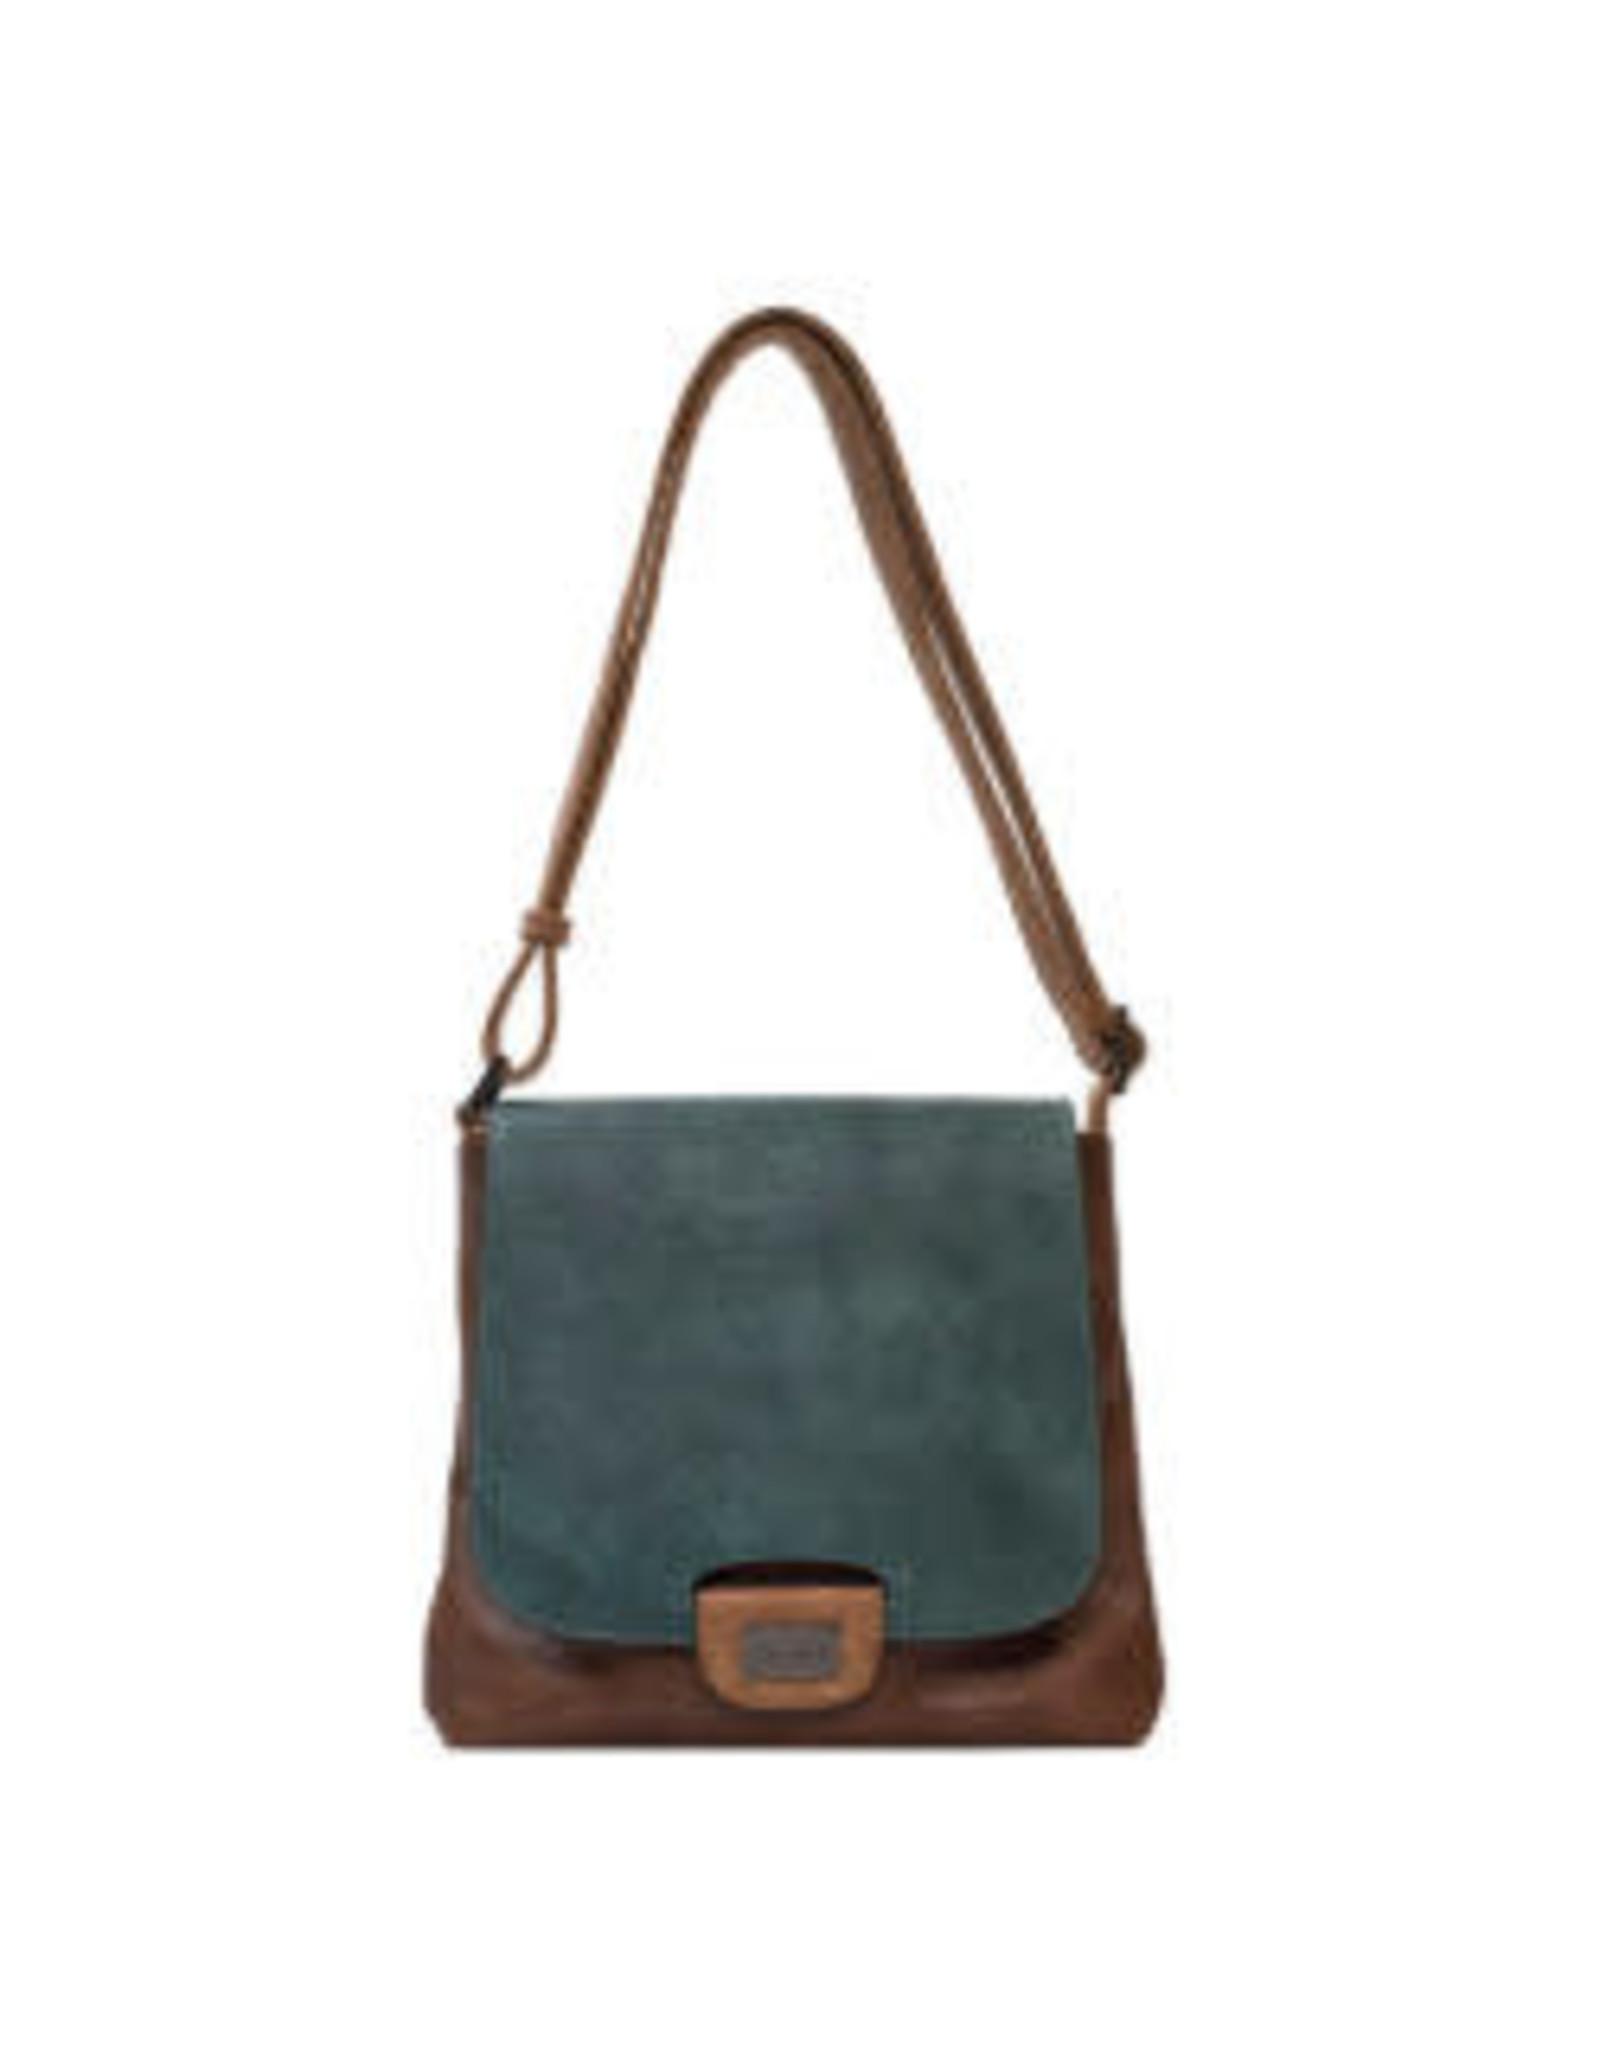 Liz Soto Amy Crossbody Handbag